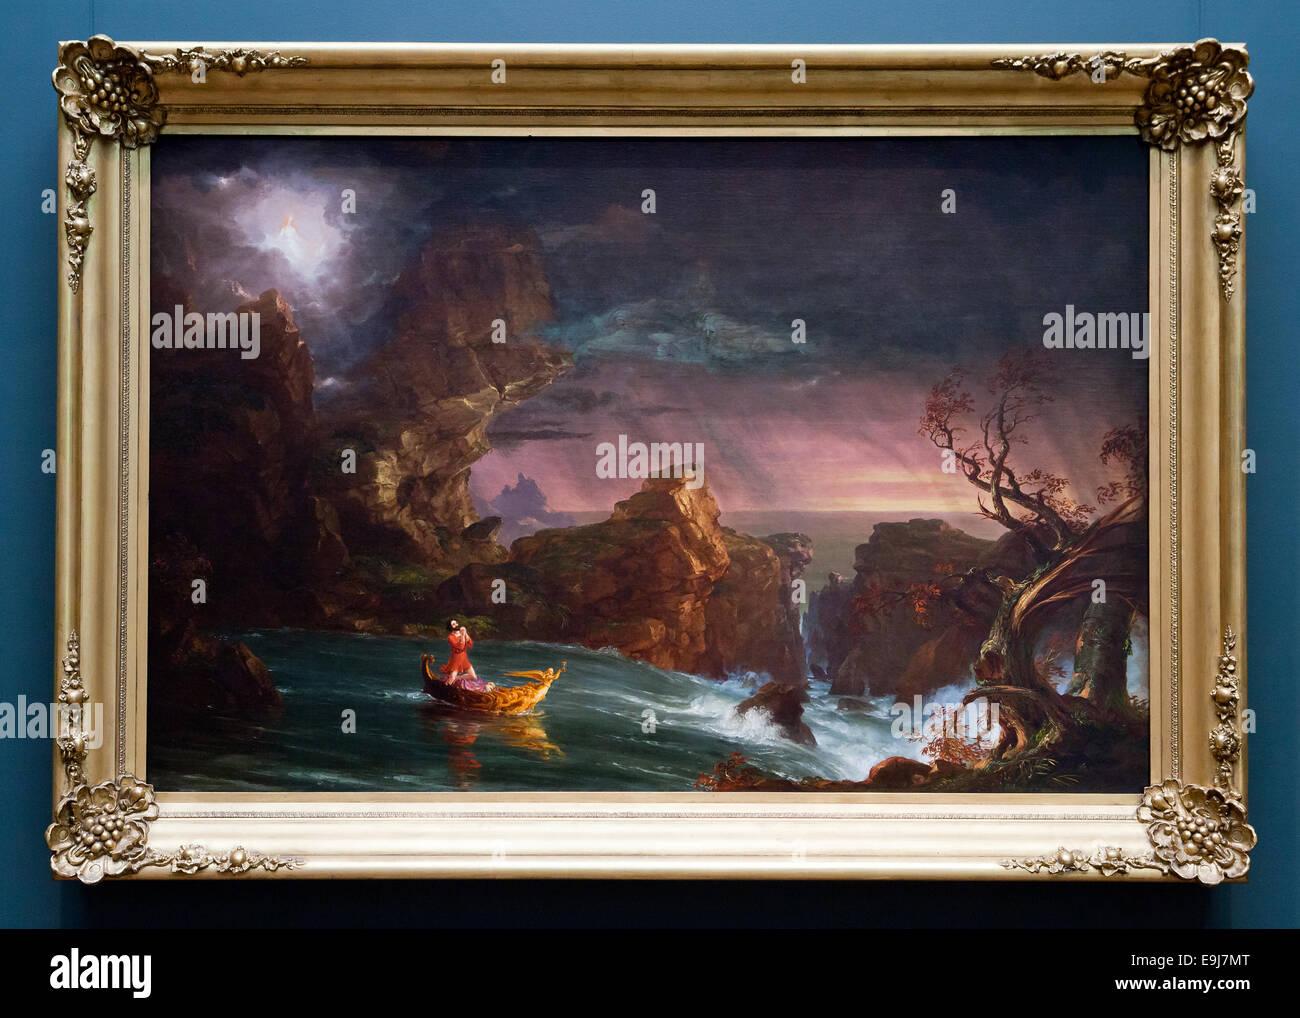 Die Reise des Lebens von Thomas Cole, 1842 Stockbild